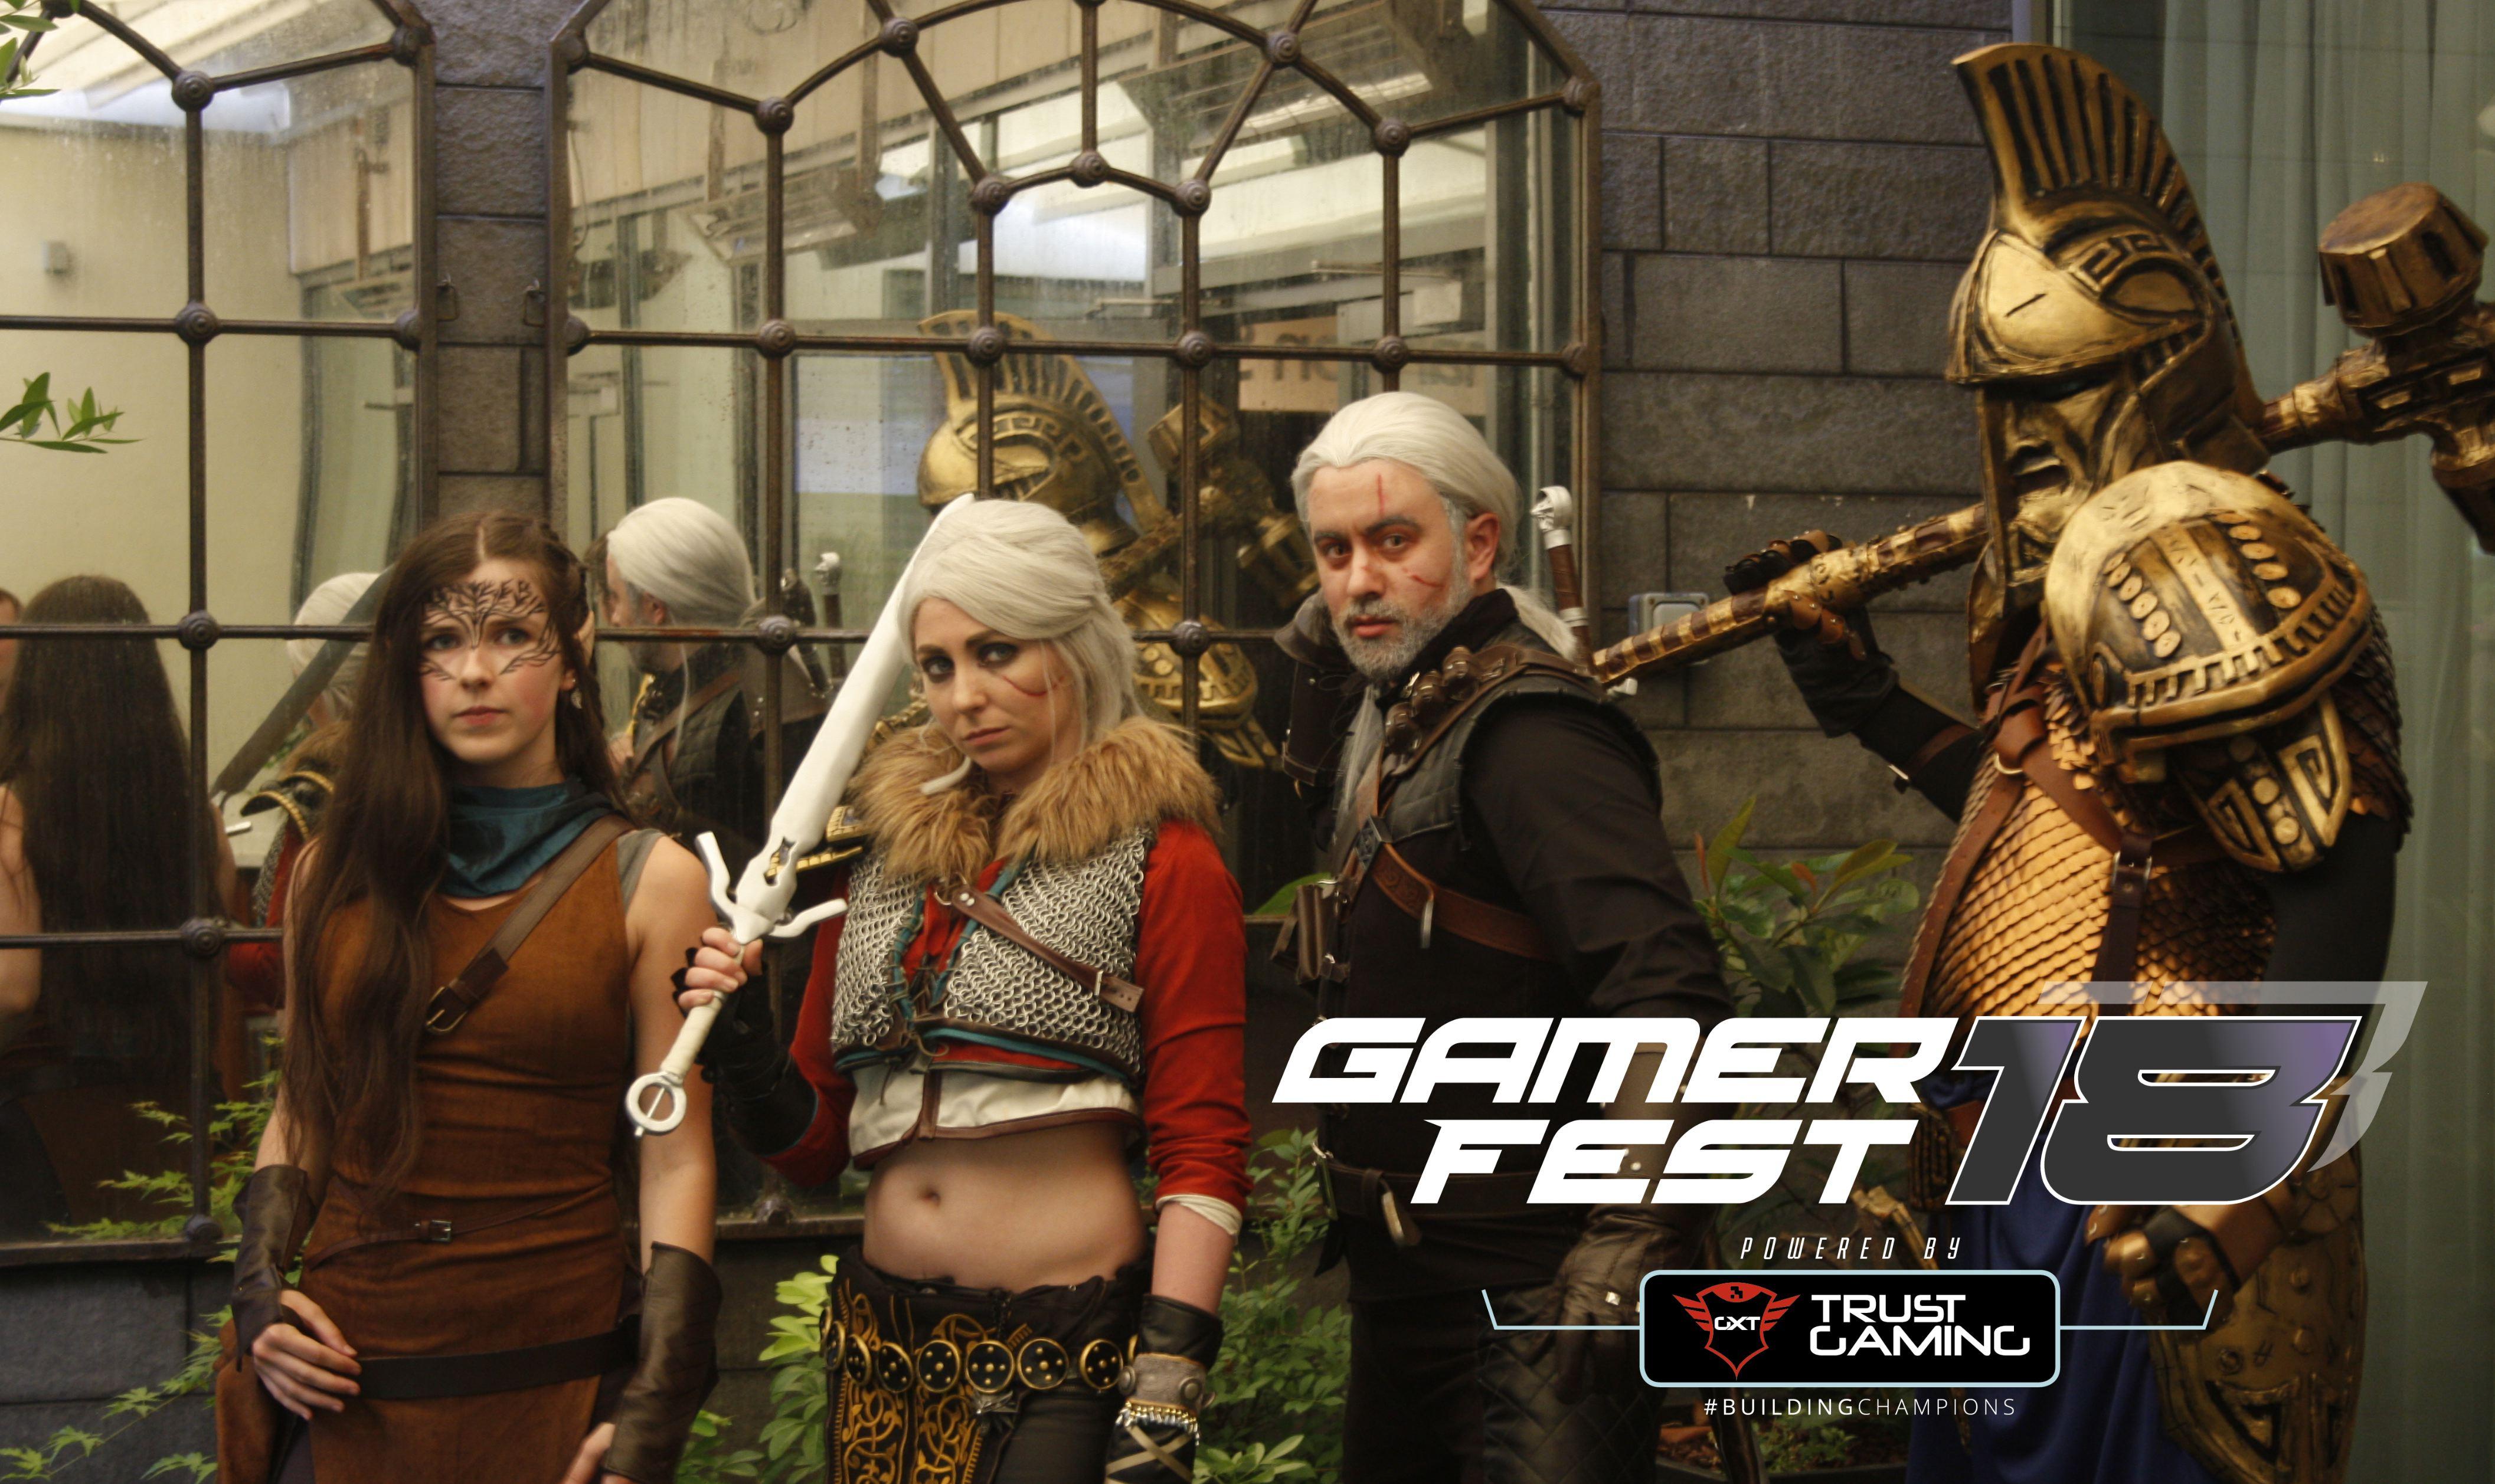 GamerFest